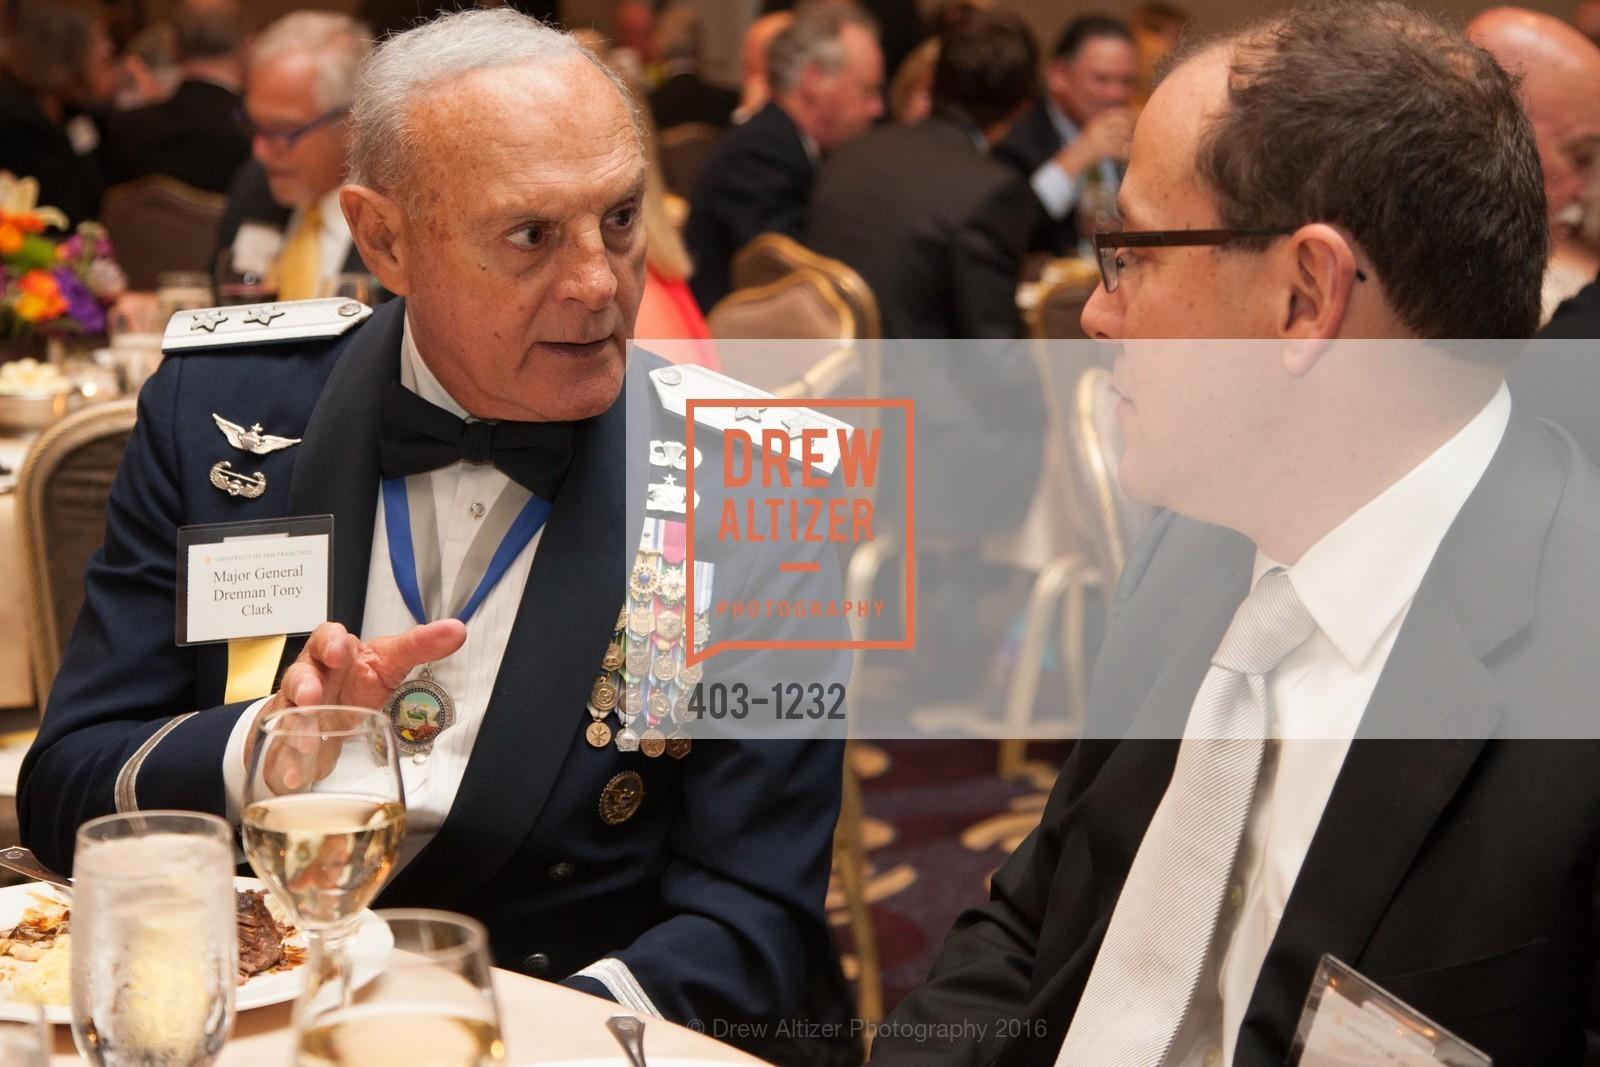 Major General Drennan Tony Clark, Photo #403-1232